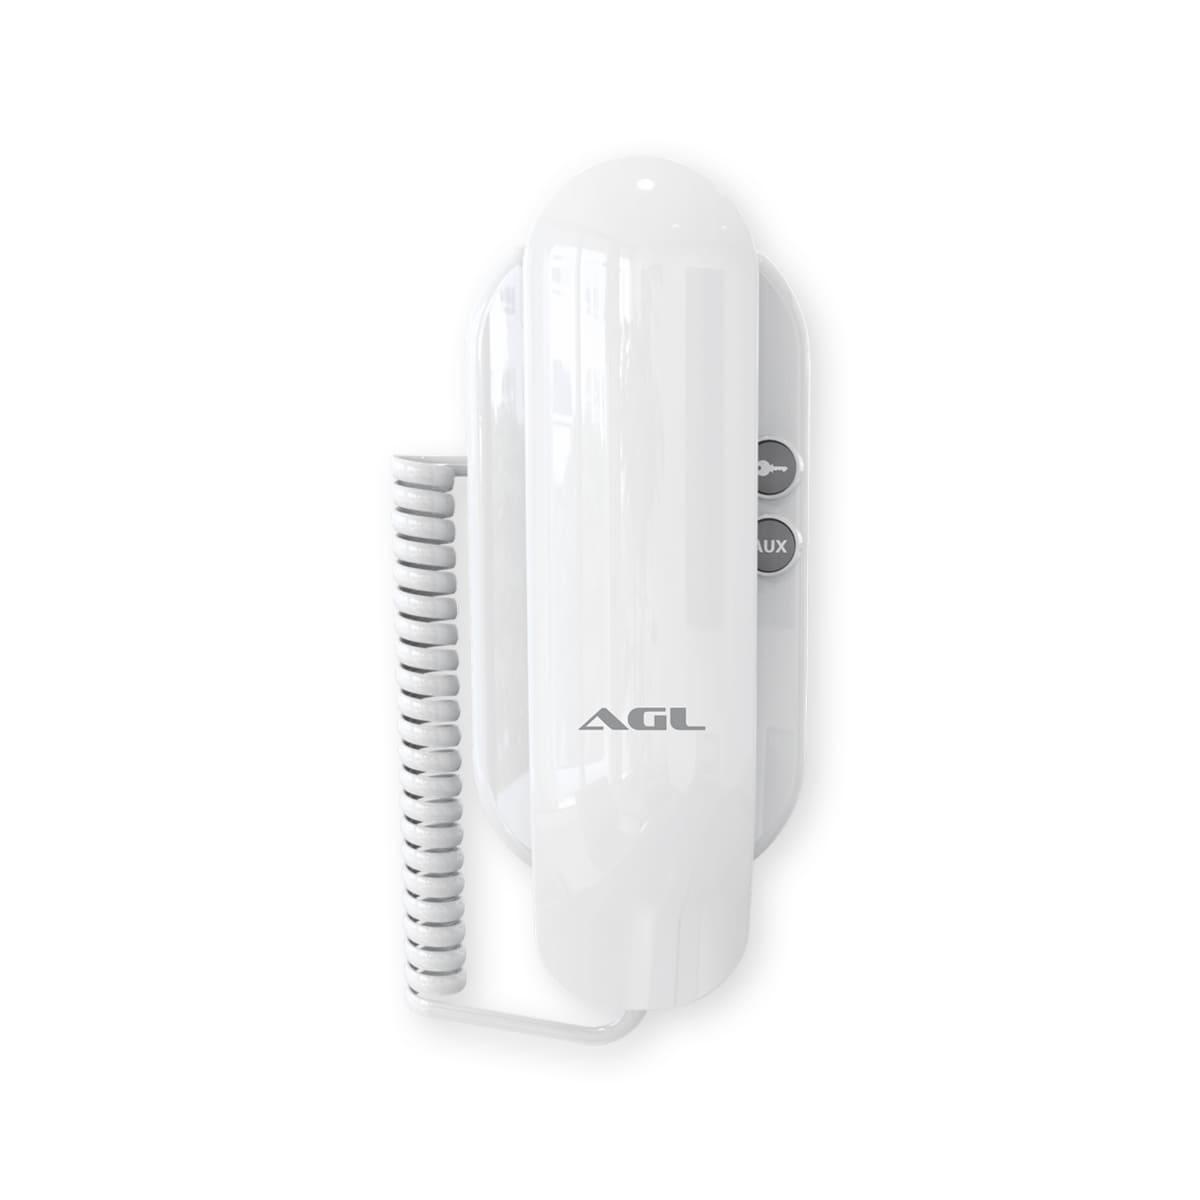 Interfone Porteiro Eletrônico Residencial AGL S100 Slim